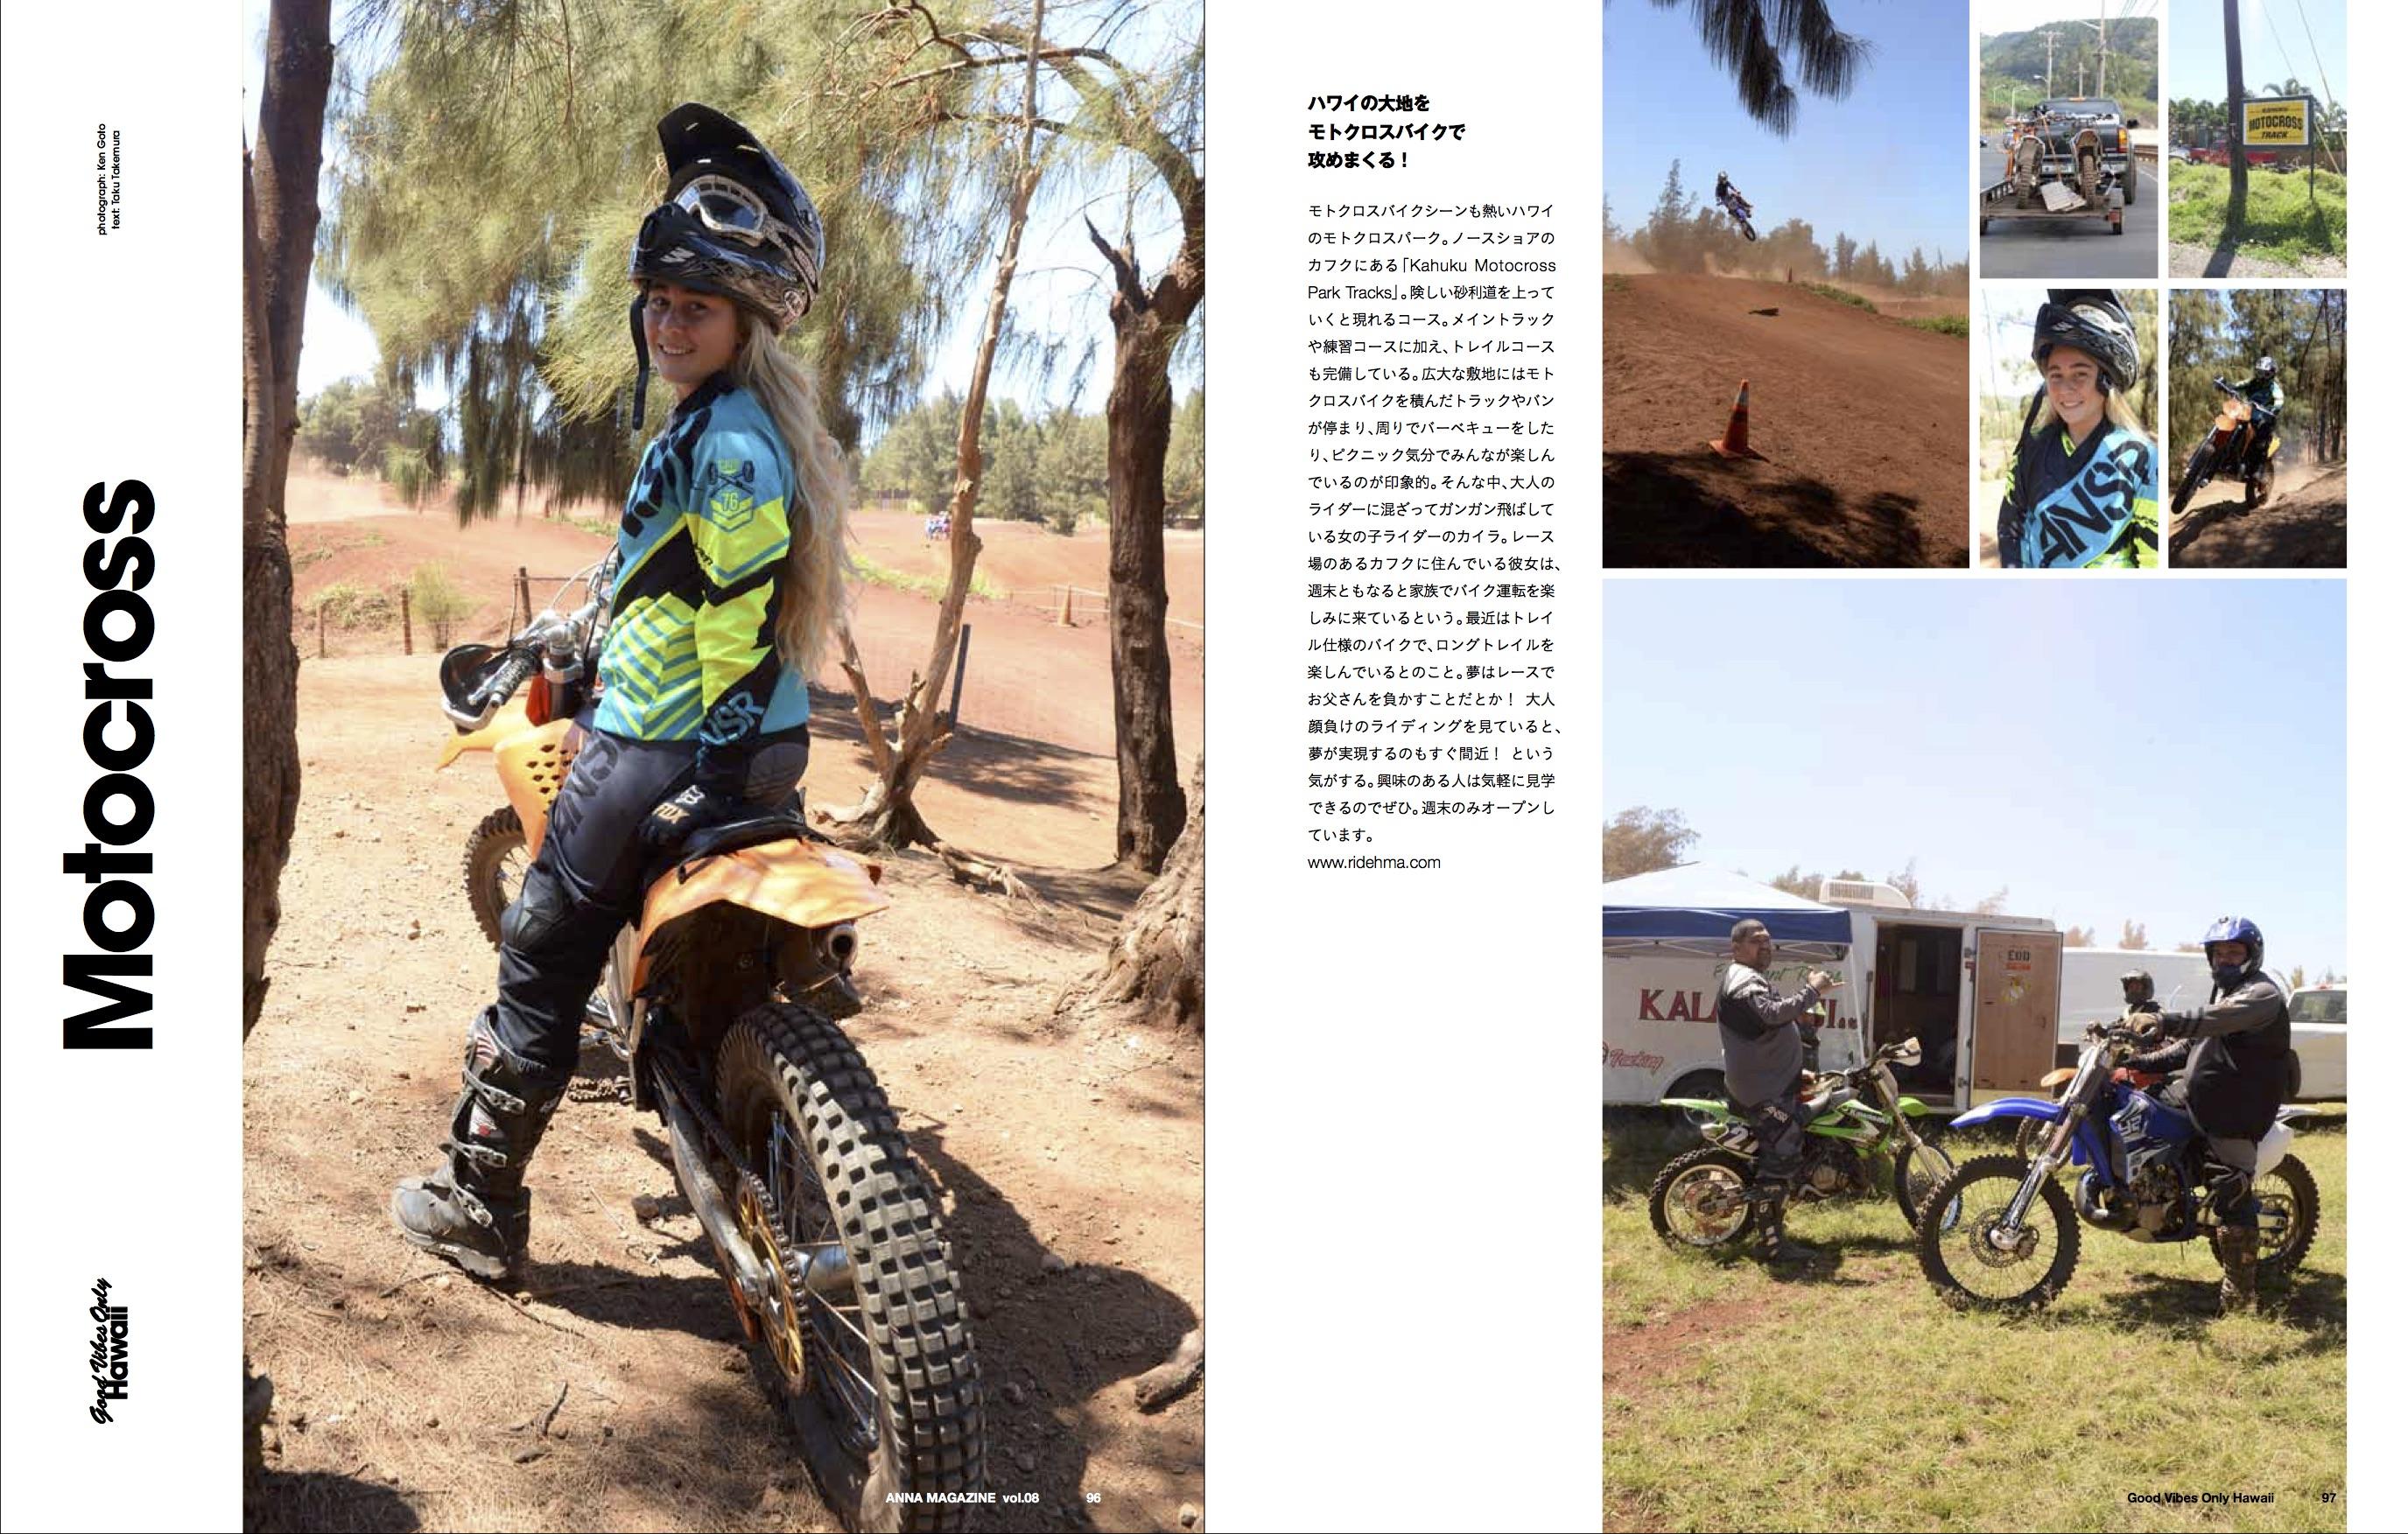 anna magazine vol.8 P46